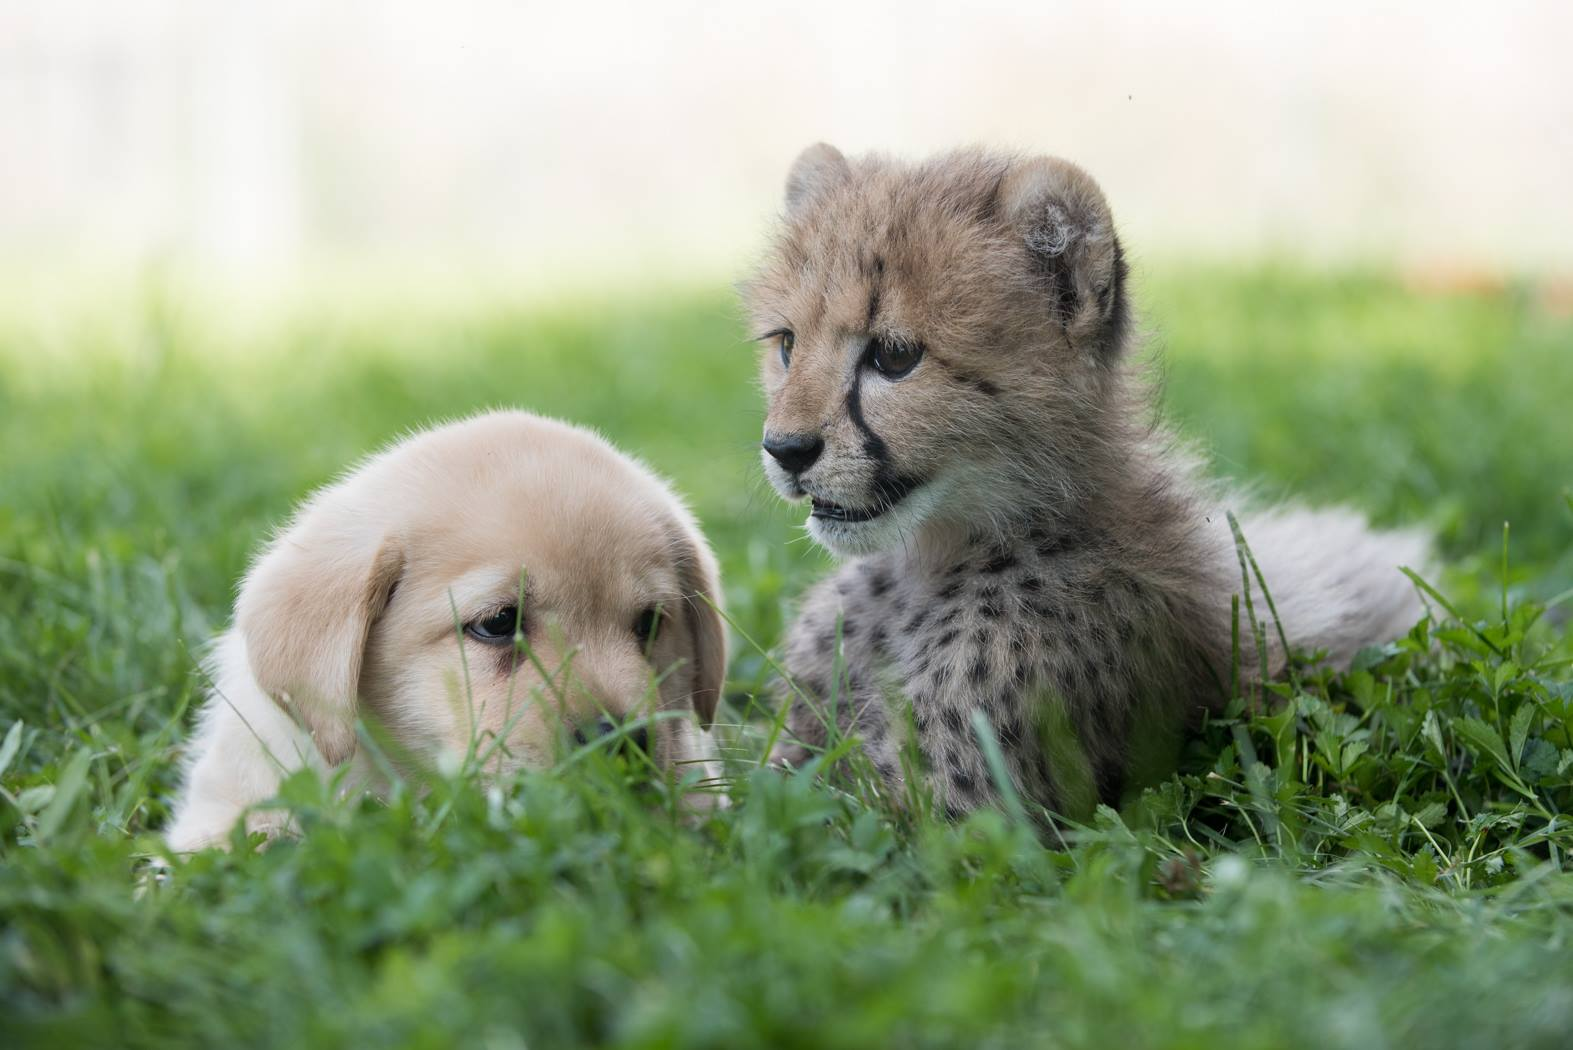 cheetah-puppy-bff-3